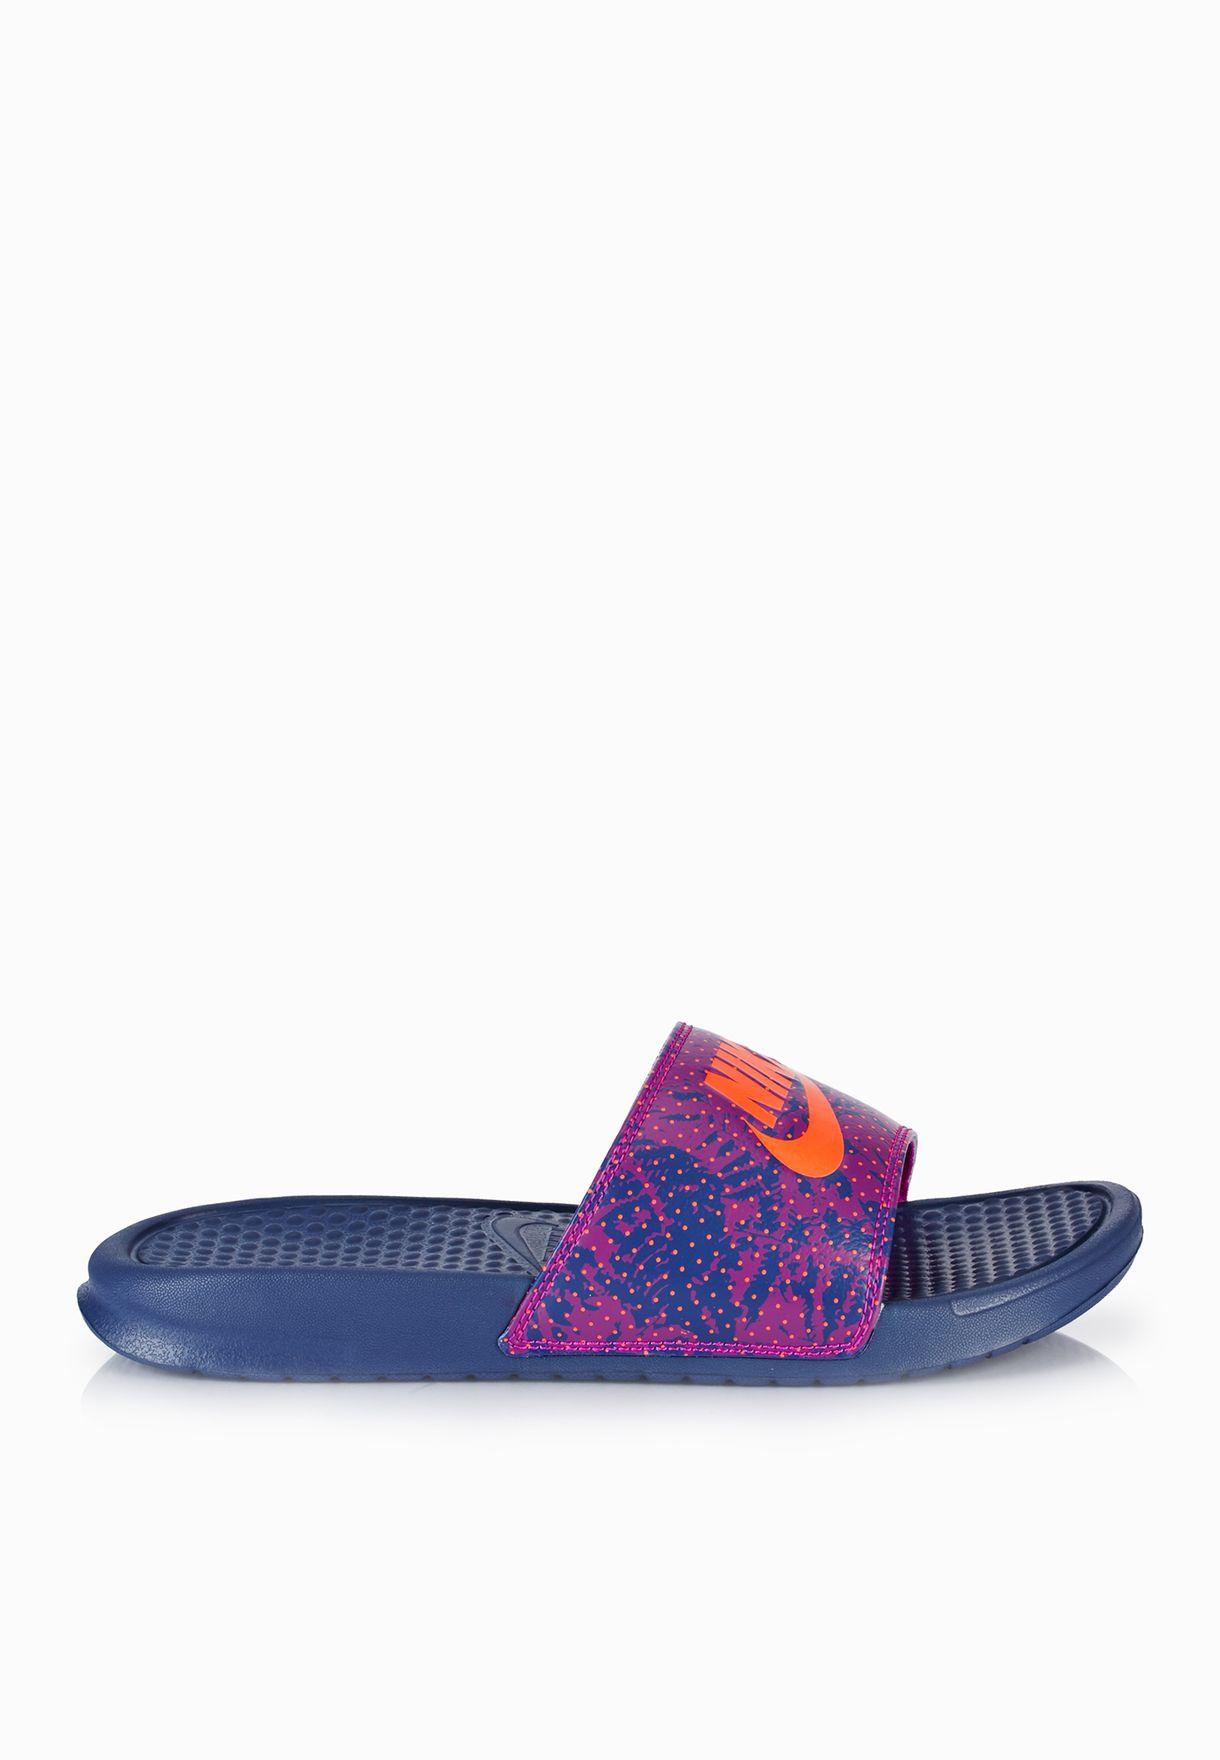 142bb0675ff4 Shop Nike purple Benassi JDI Print 618919-585 for Women in UAE ...